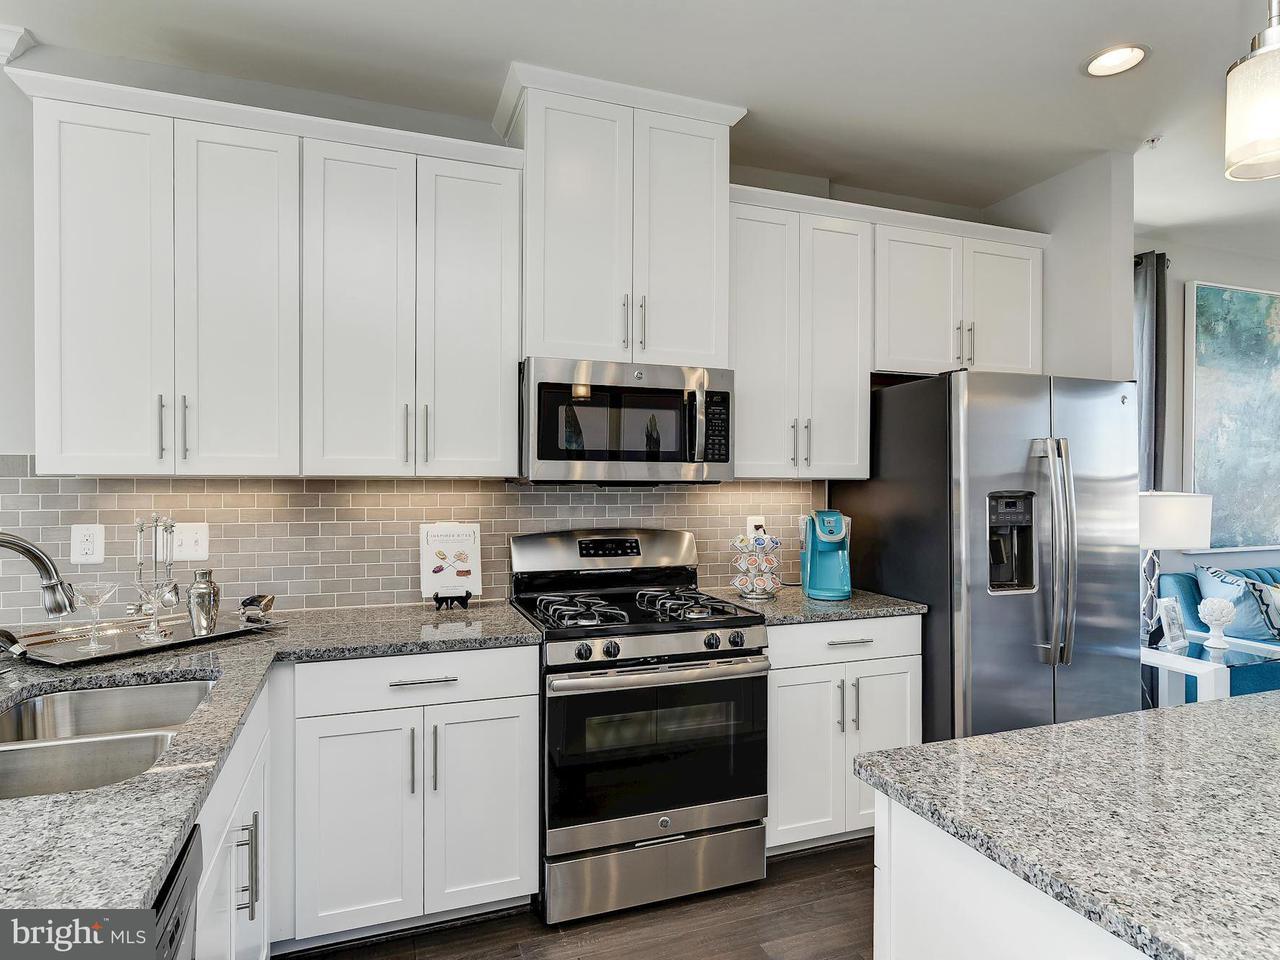 Additional photo for property listing at 3621 Jamison St Ne 3621 Jamison St Ne Washington, 컬럼비아주 20018 미국